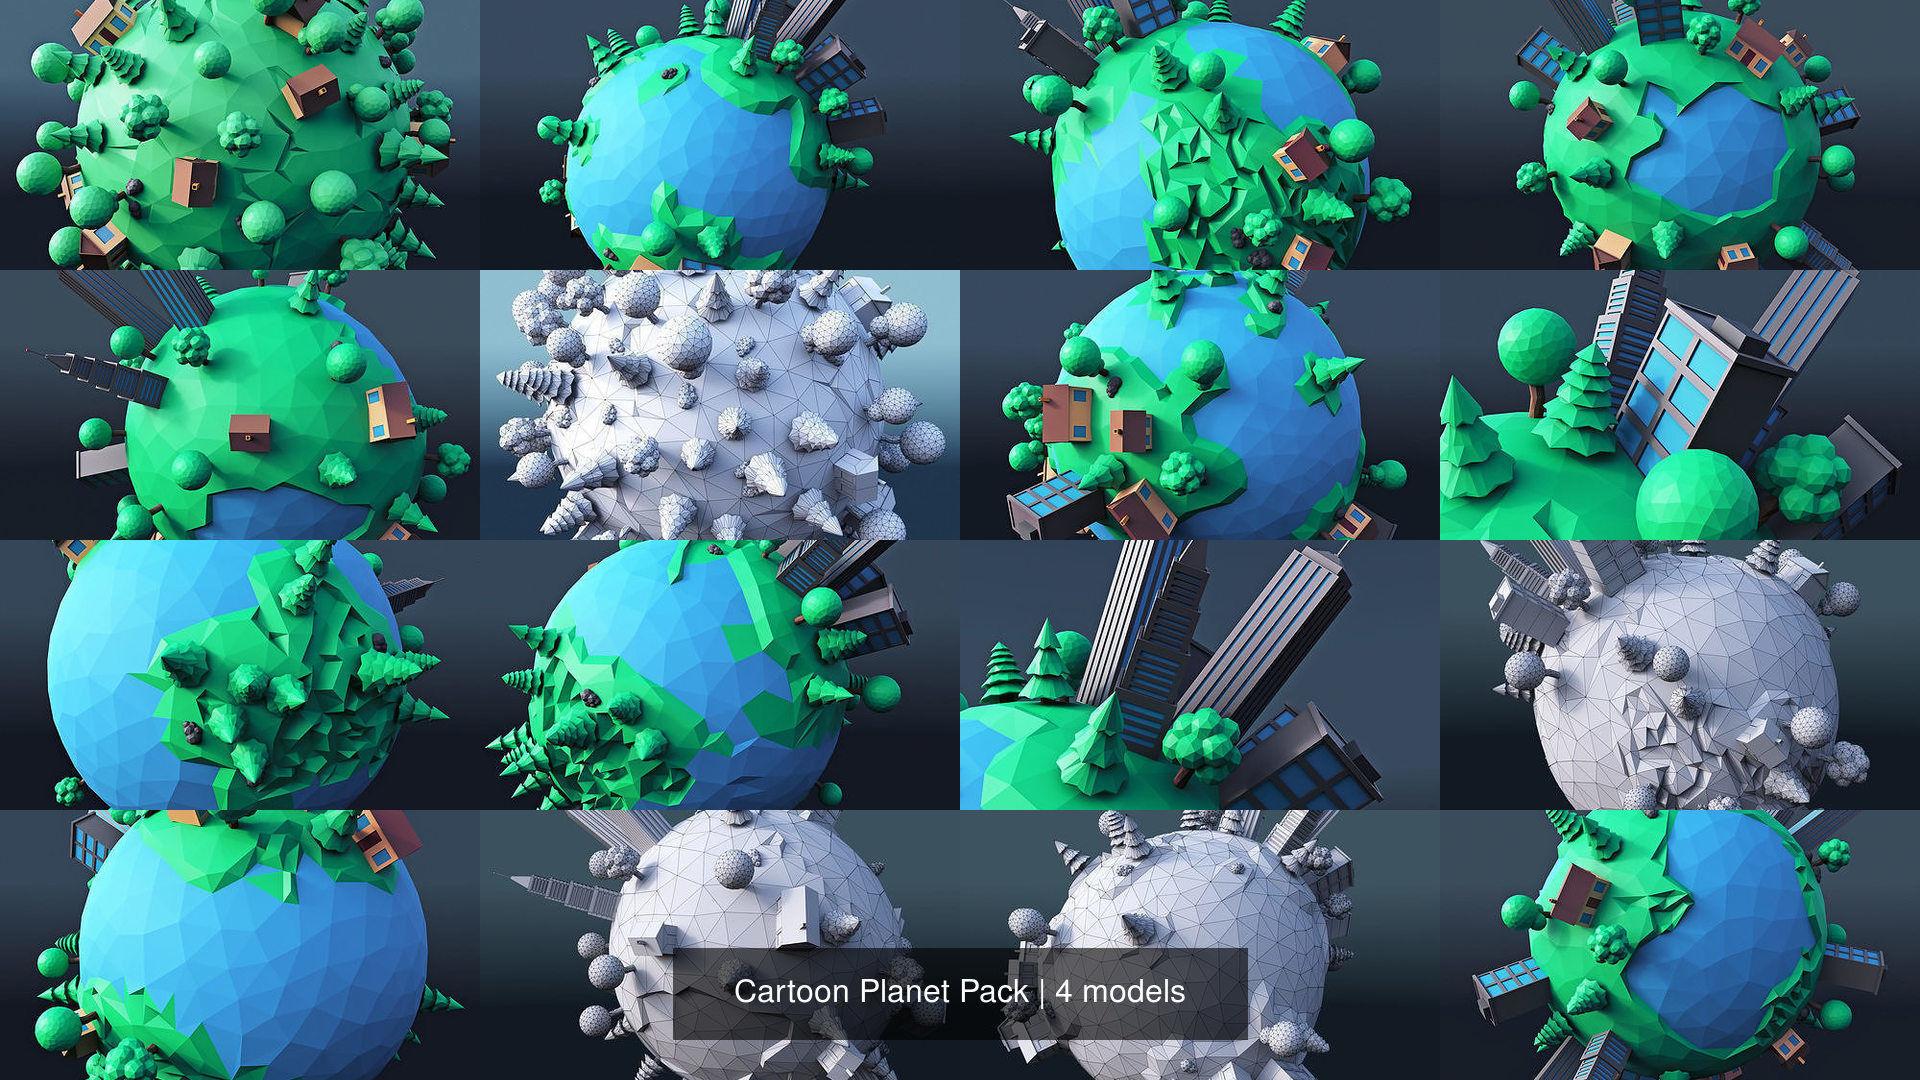 Cartoon Planet Pack